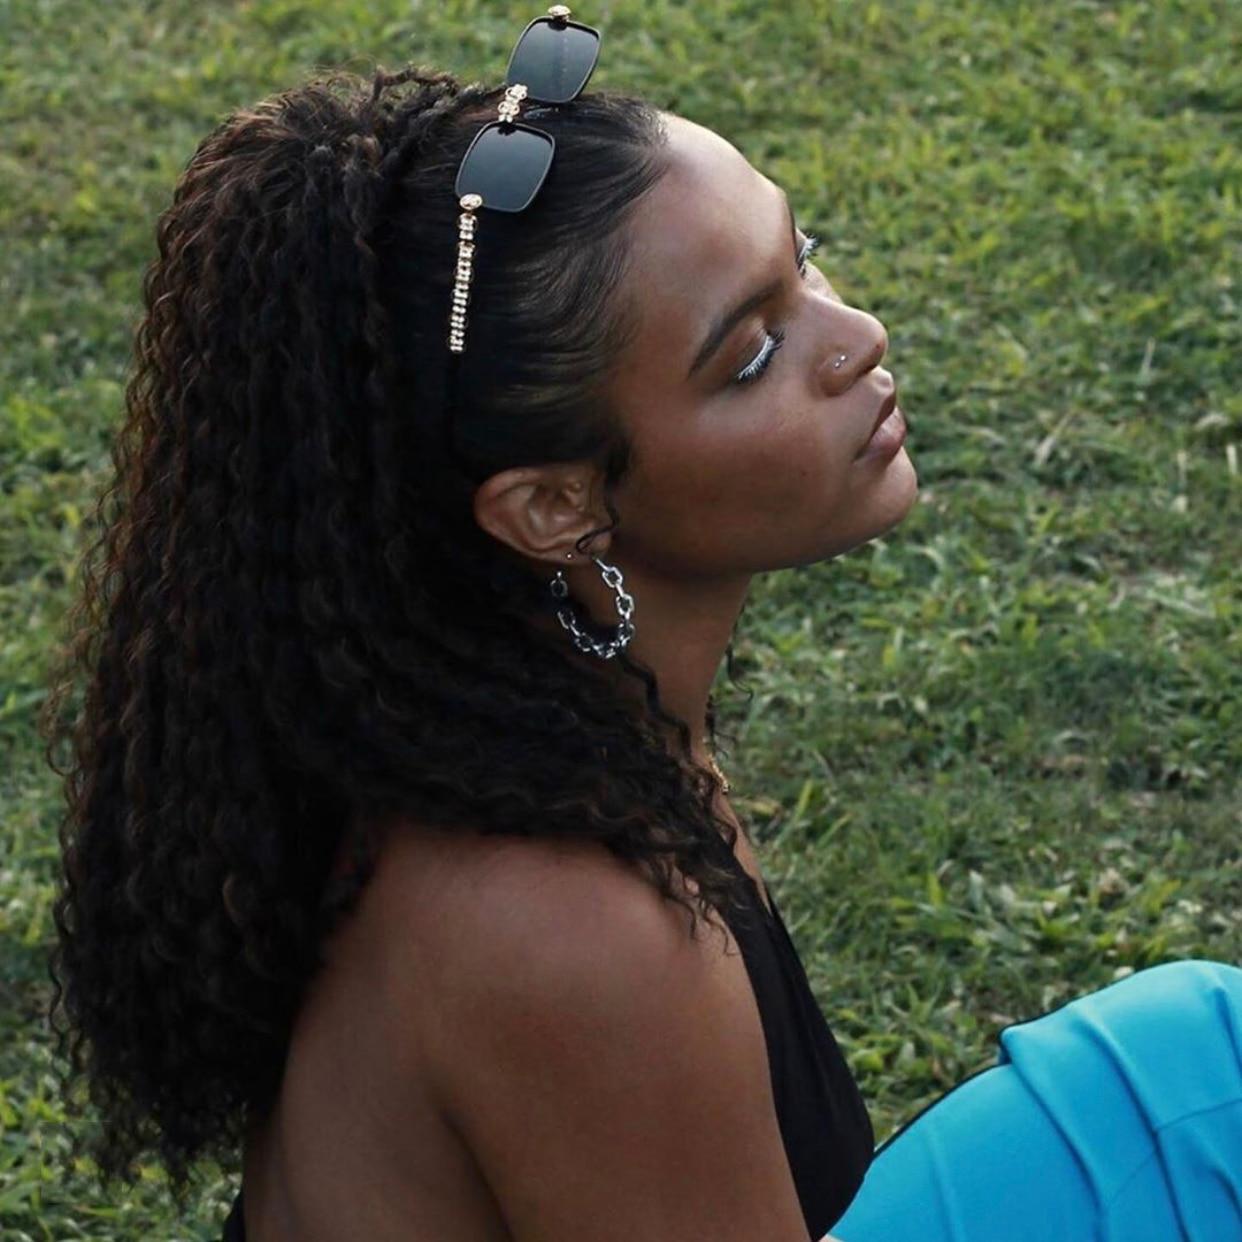 Rectangle Rhinestone Sunglasses Women Fashion Steampunk Diamond Sun Glasses Crystal Vintage Shades Eyeglasses UV400 Oculos